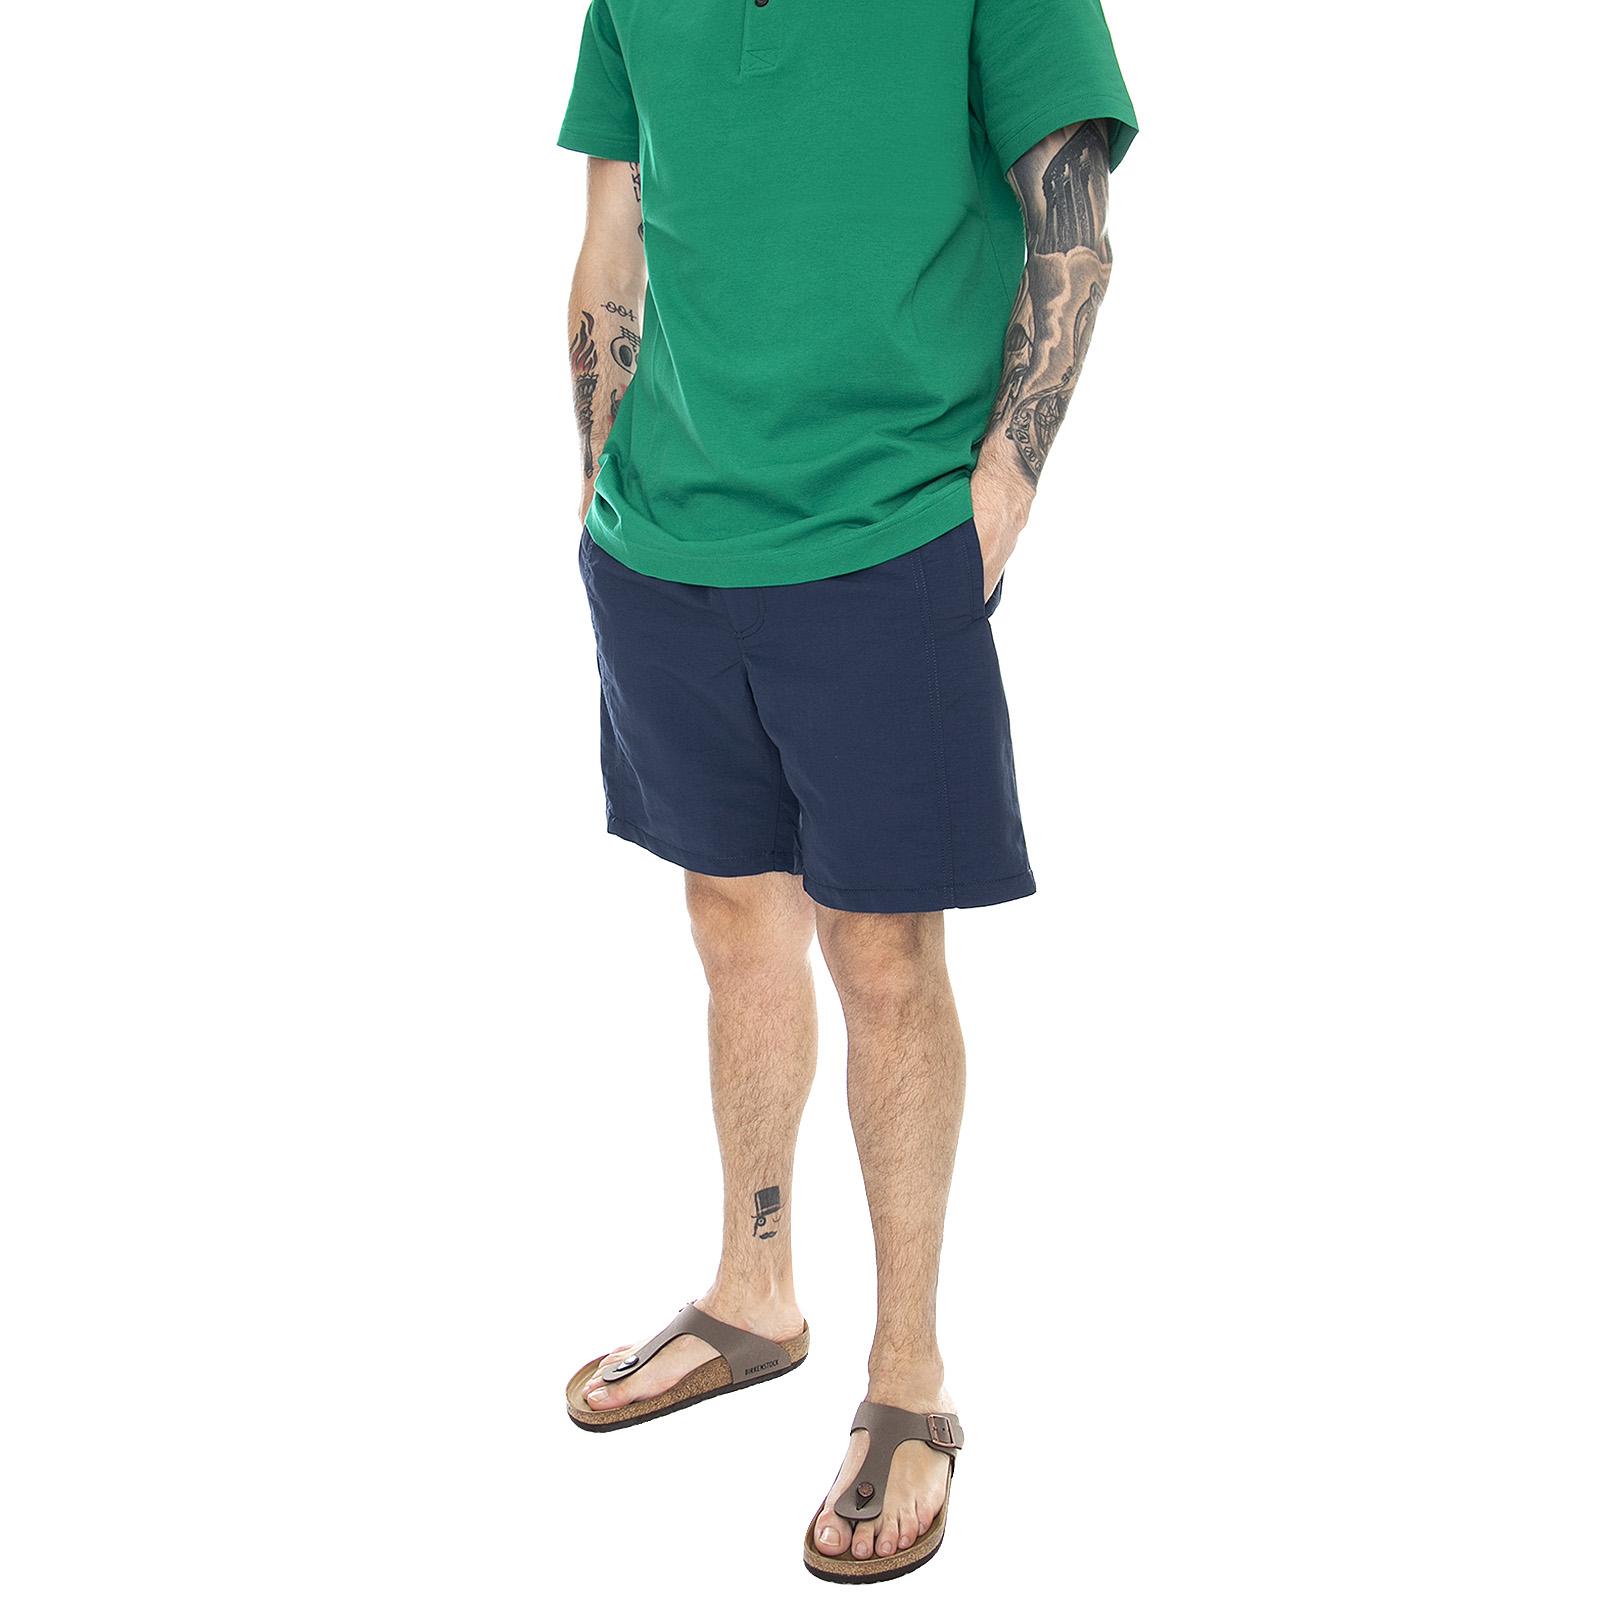 Vans vans x pilgrim surf supply shorts - dress blues - bermuda ...